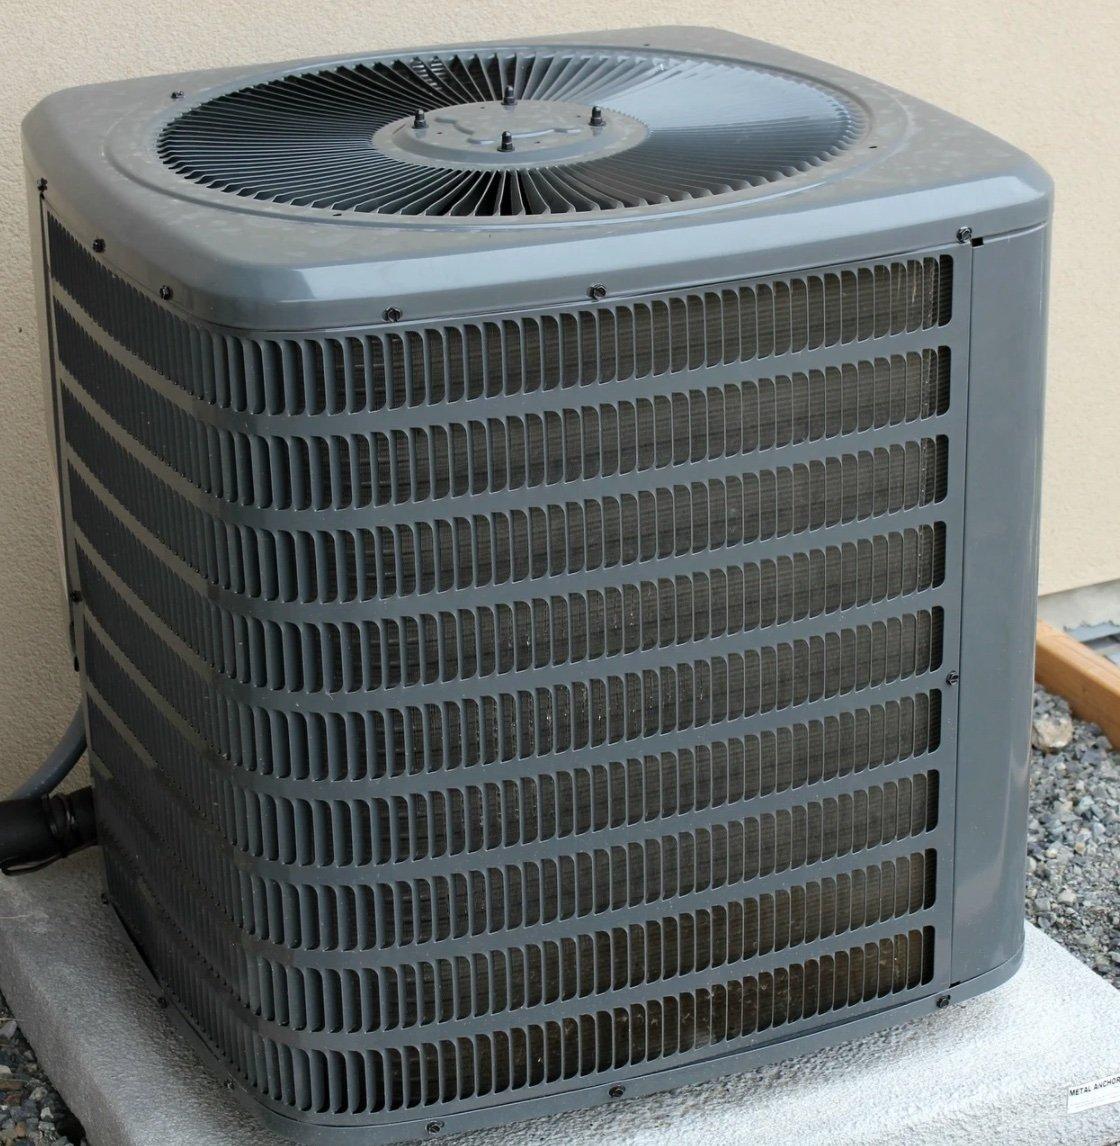 Air conditioning condensor